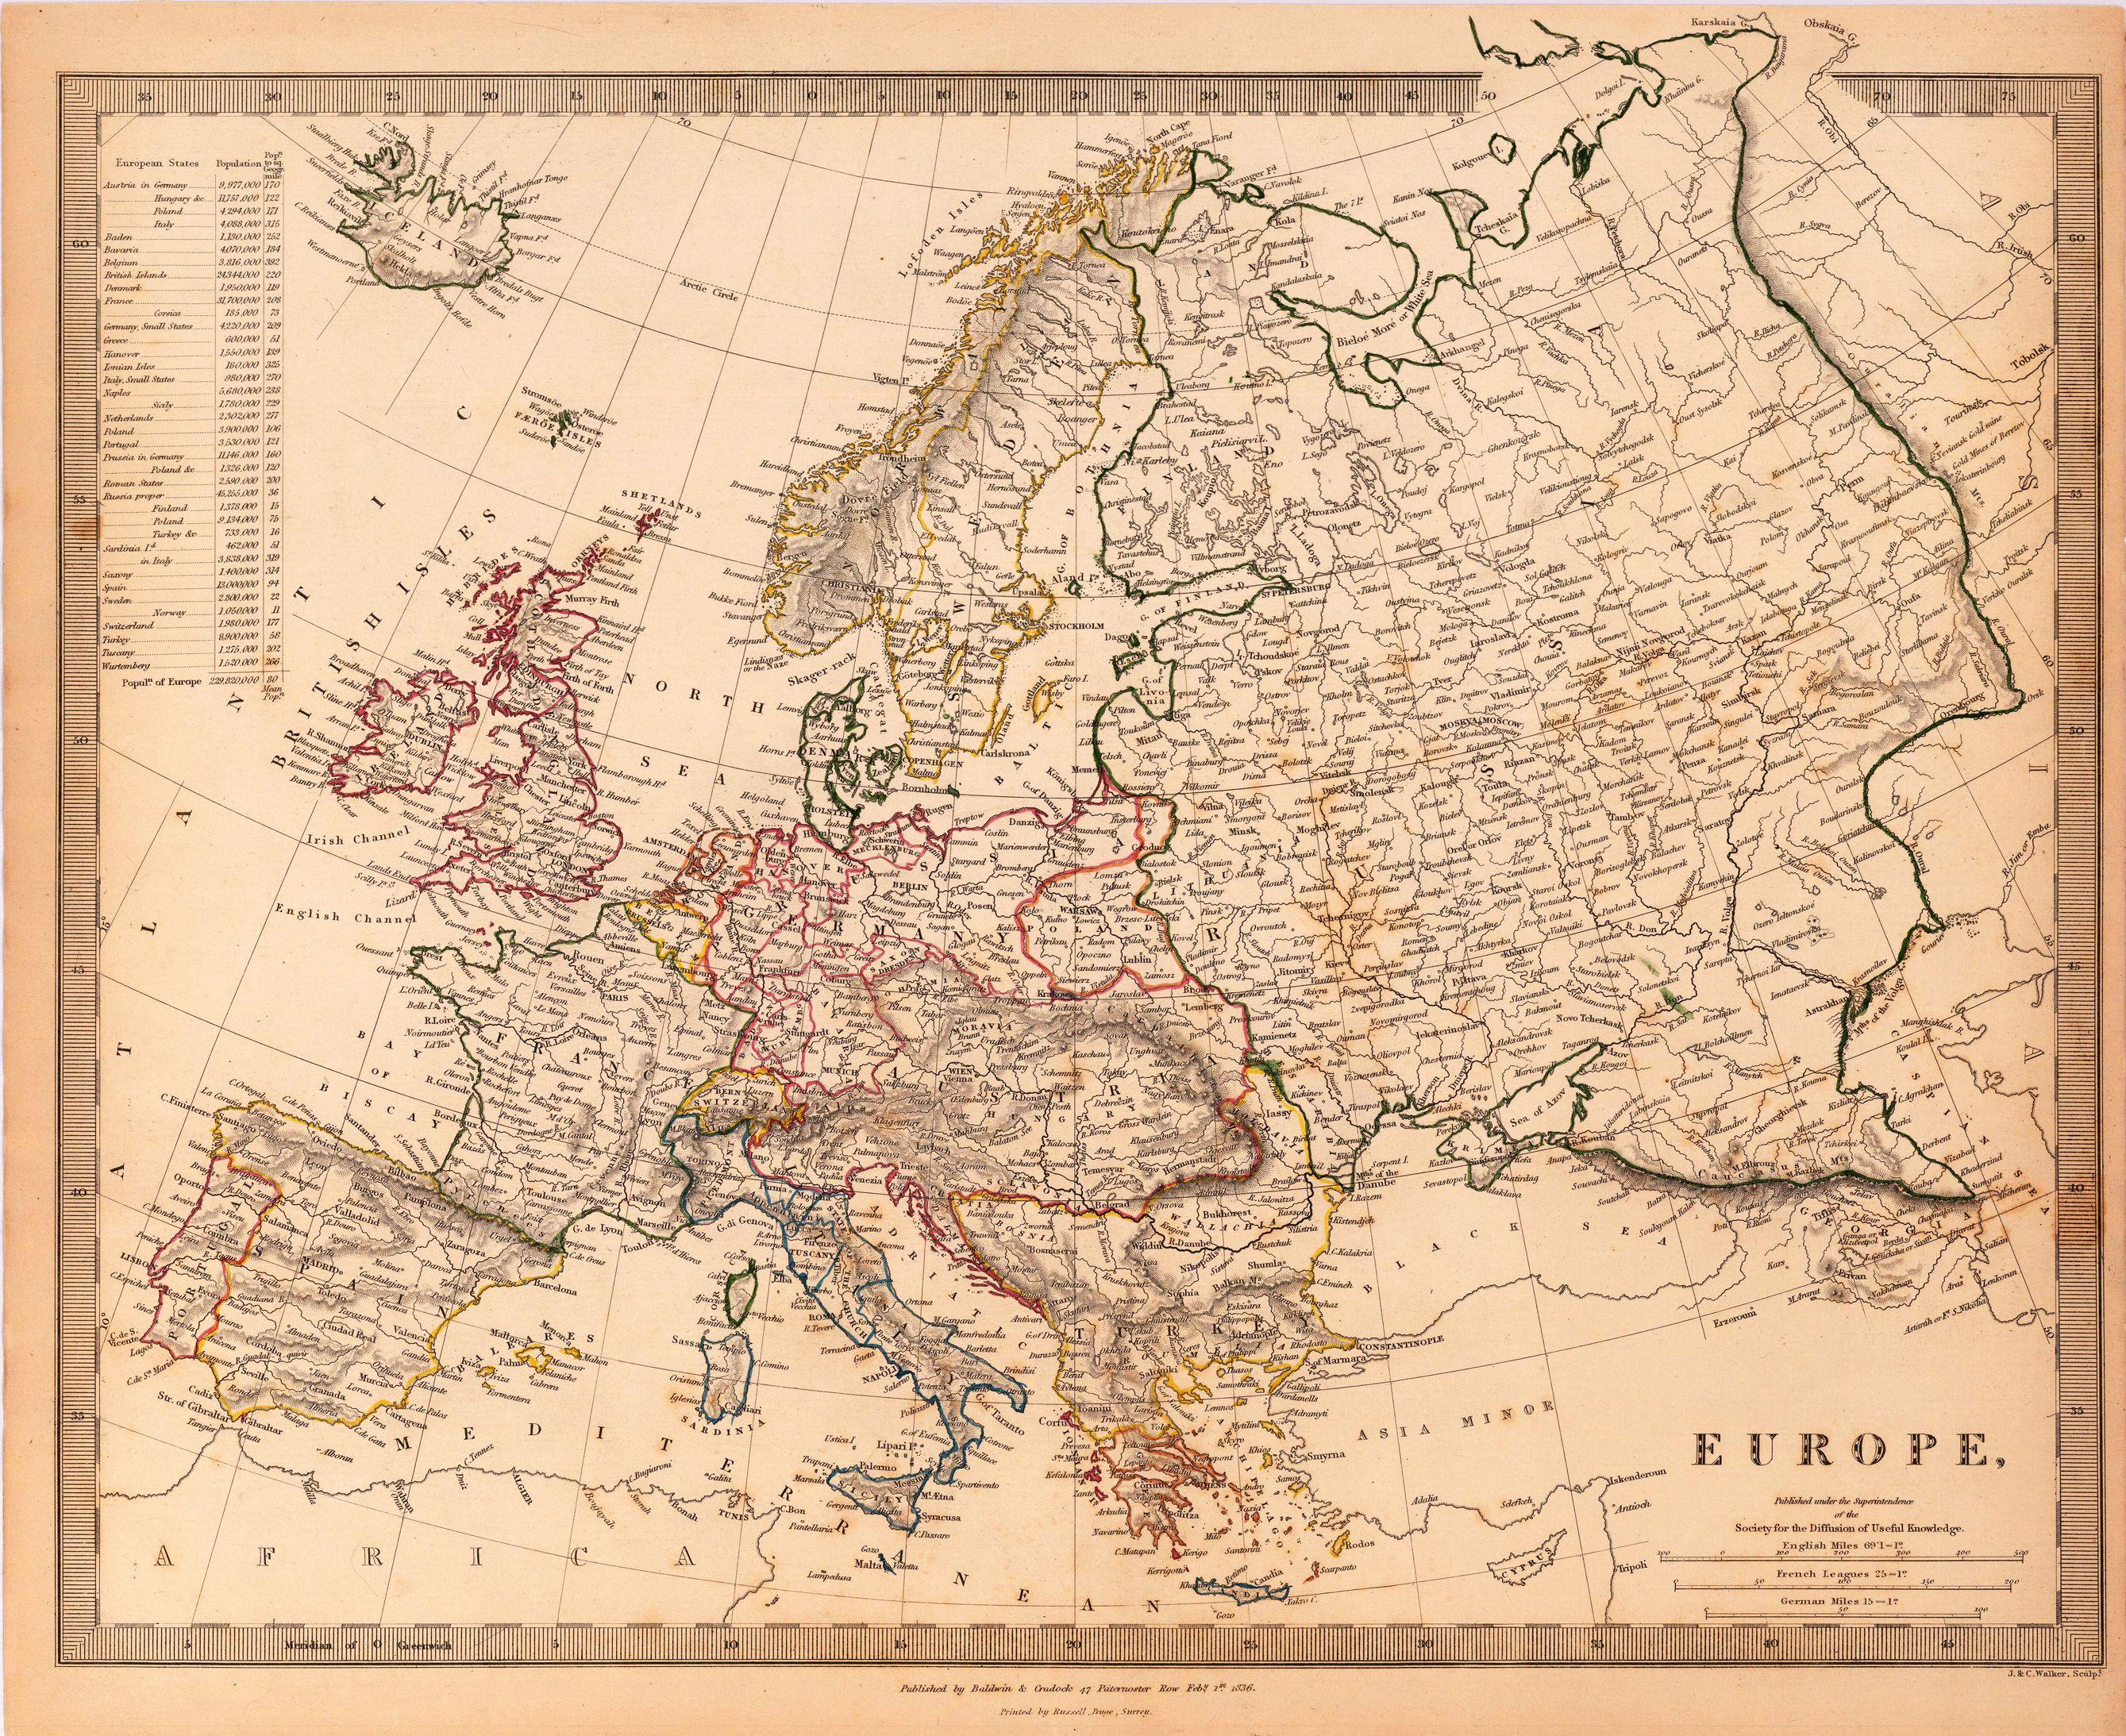 Httpwwwbergbookcomimagesjpg Mapas Historicos - Antique looking maps